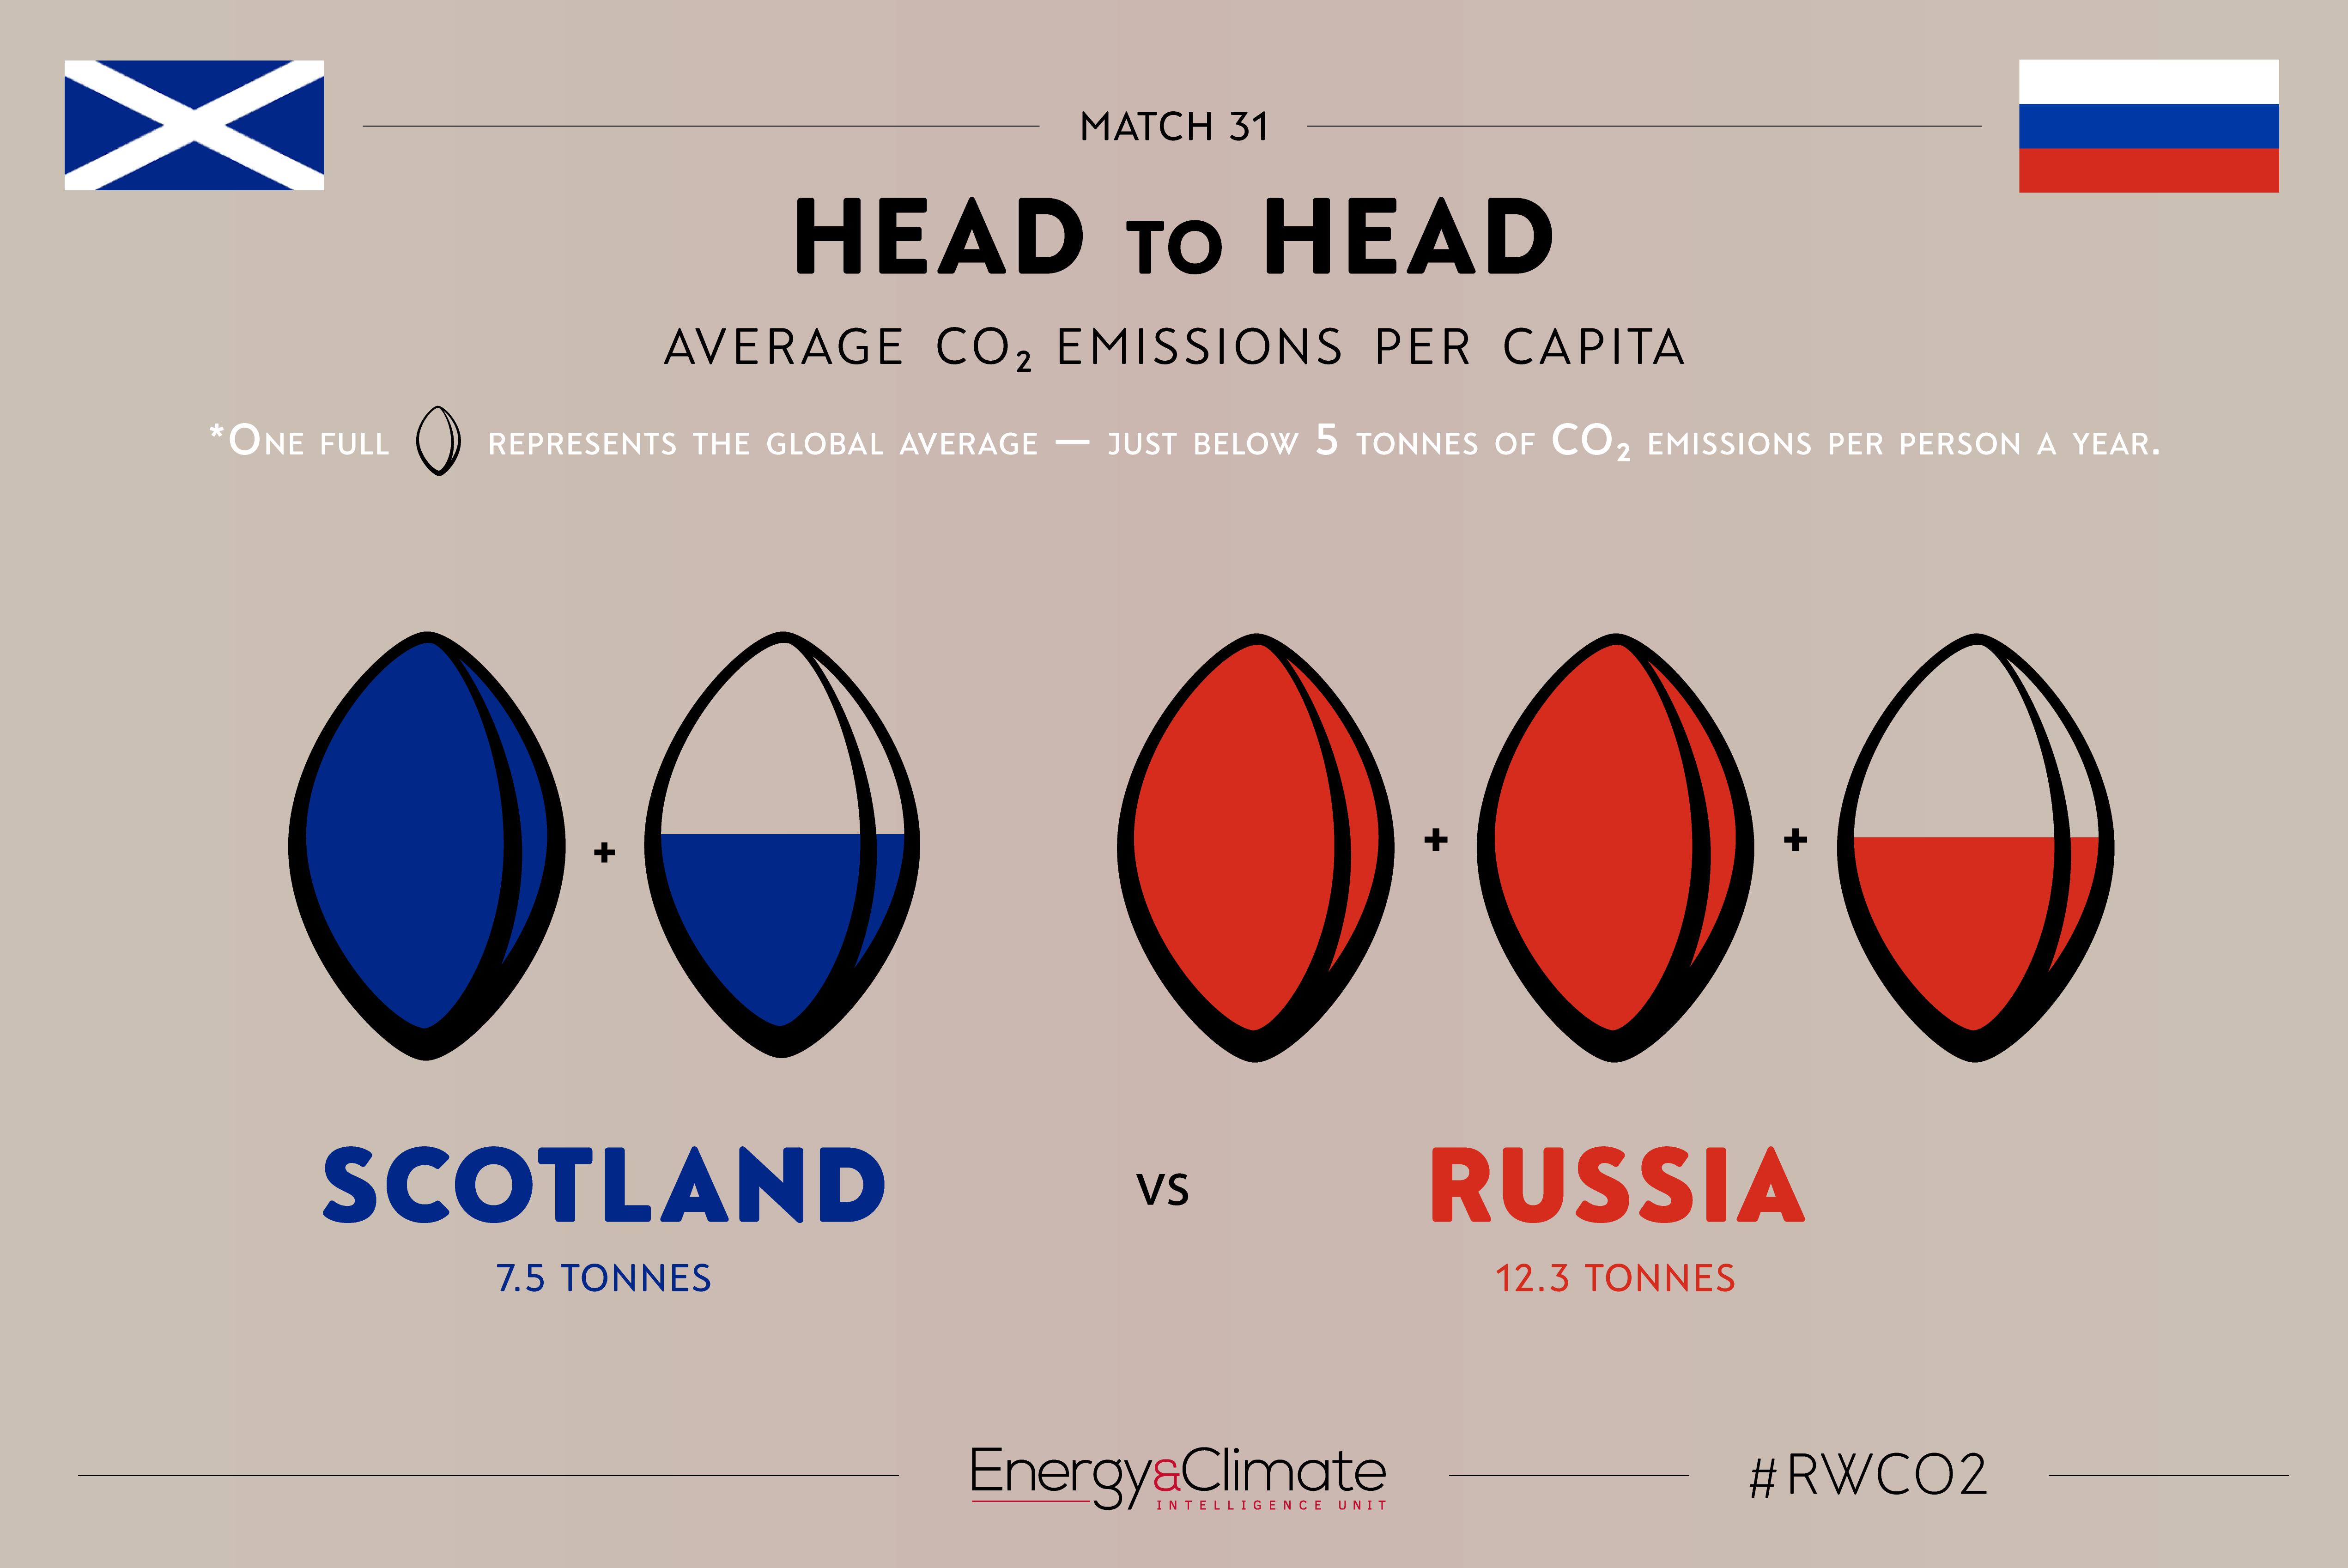 Scotland vs Russia - per capita emissions